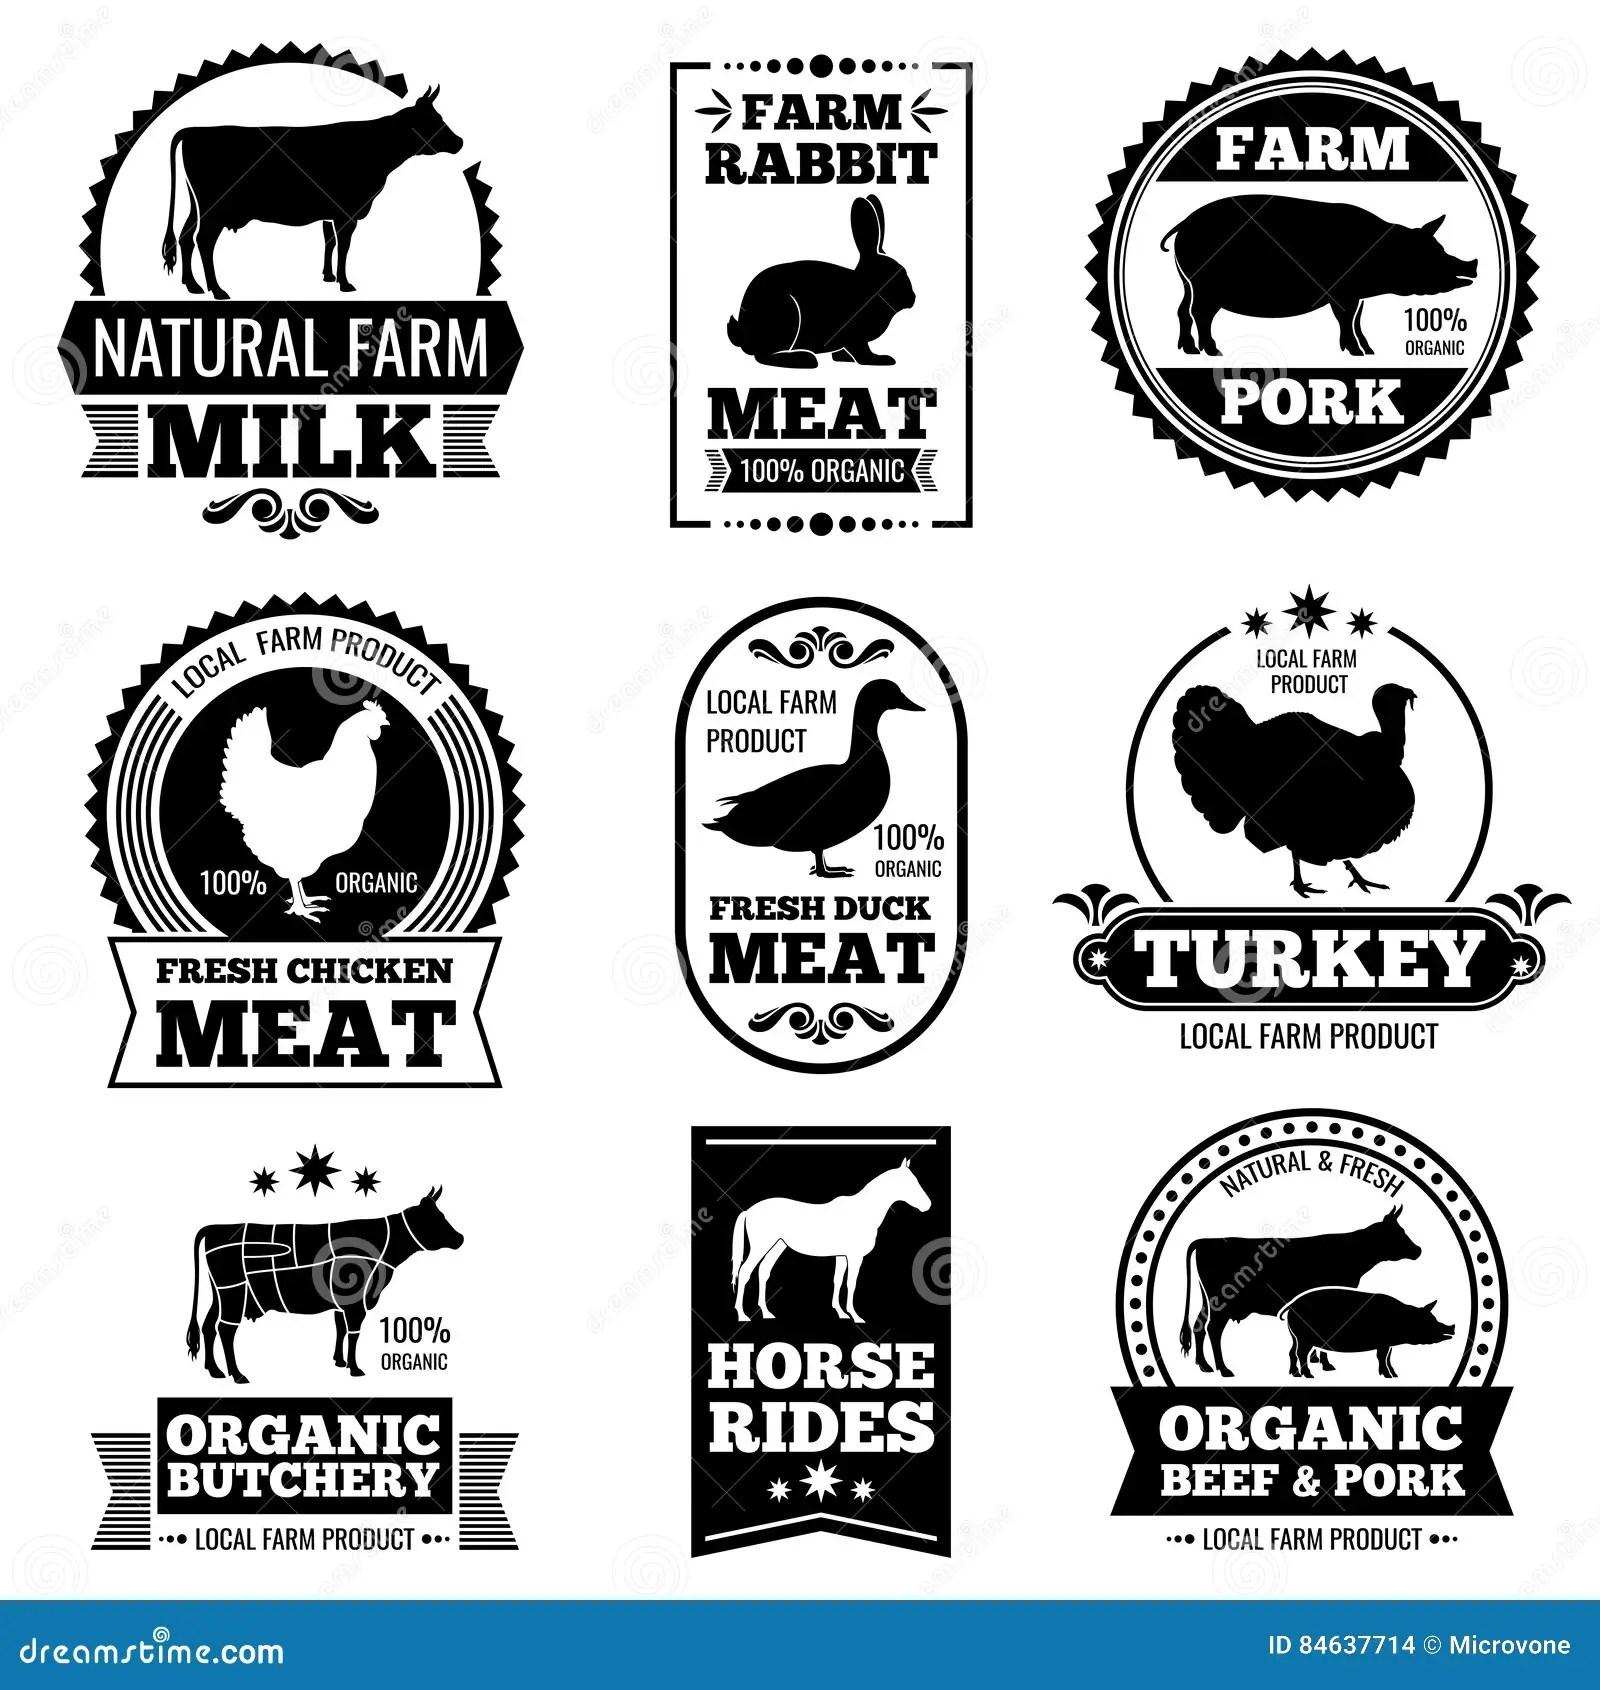 Farm Animal Vintage Meat, Butcher Shop Vector Logos